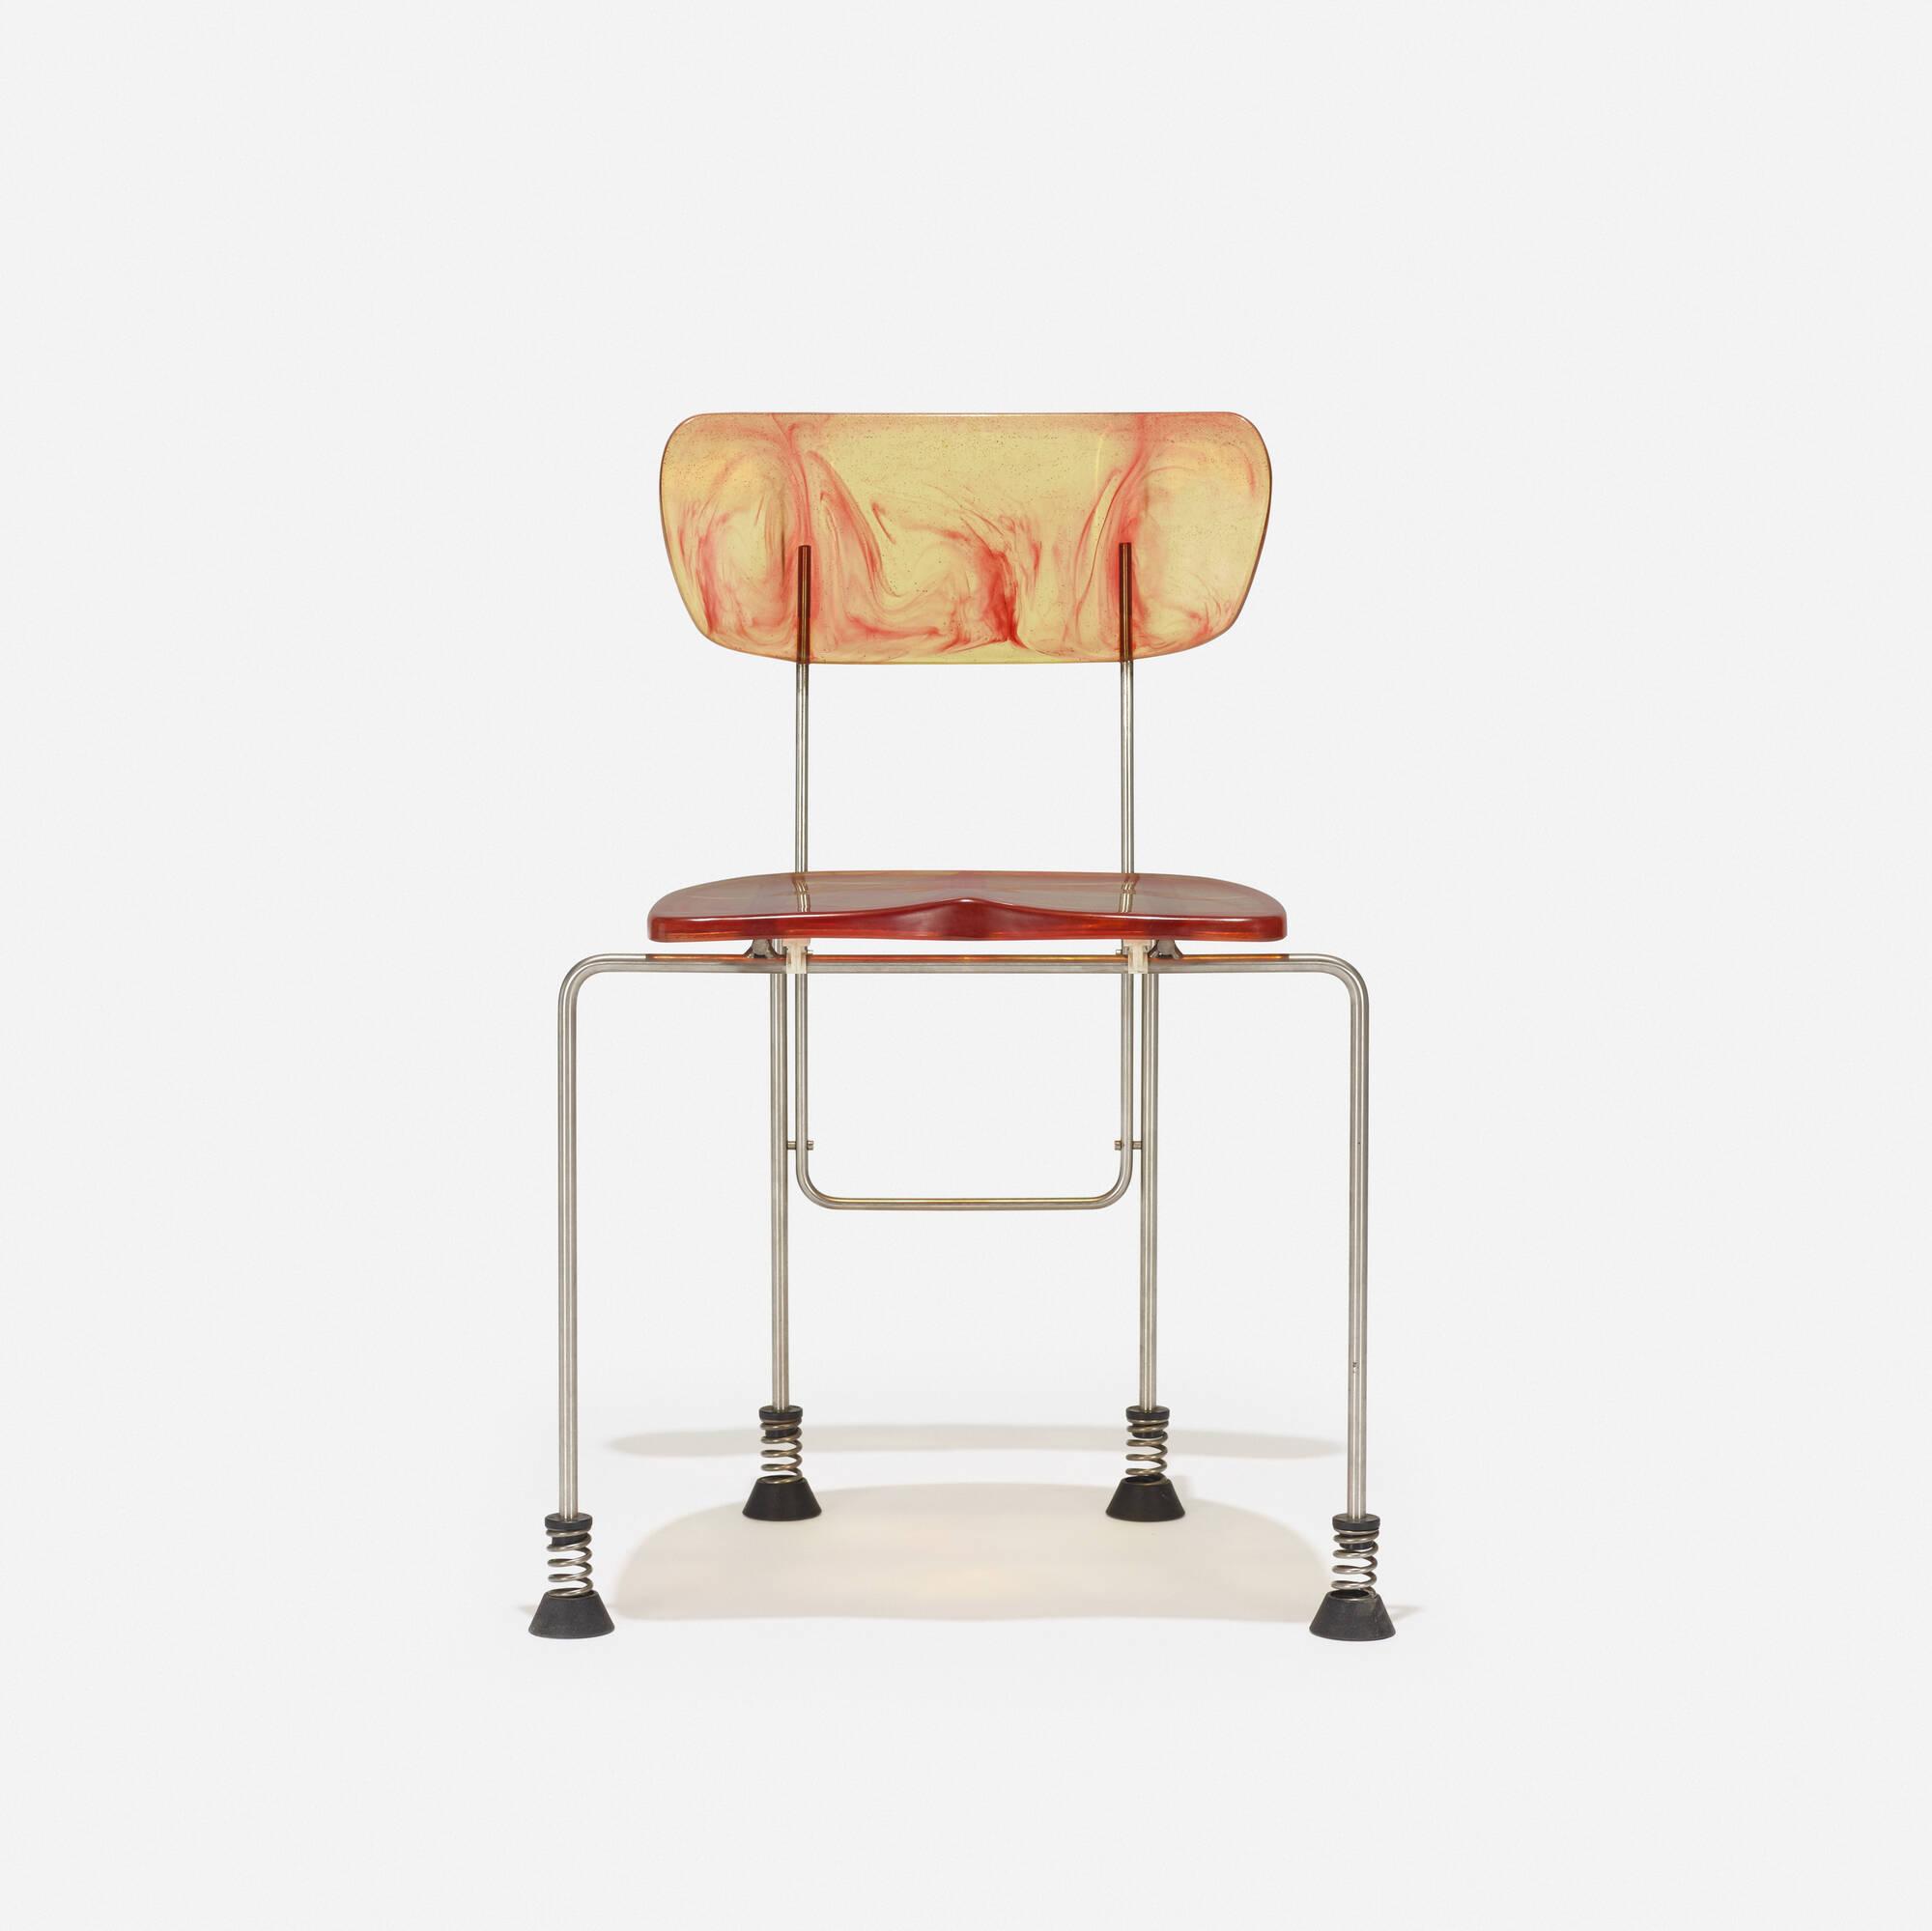 327: Gaetano Pesce / 543 Broadway chair (1 of 4)